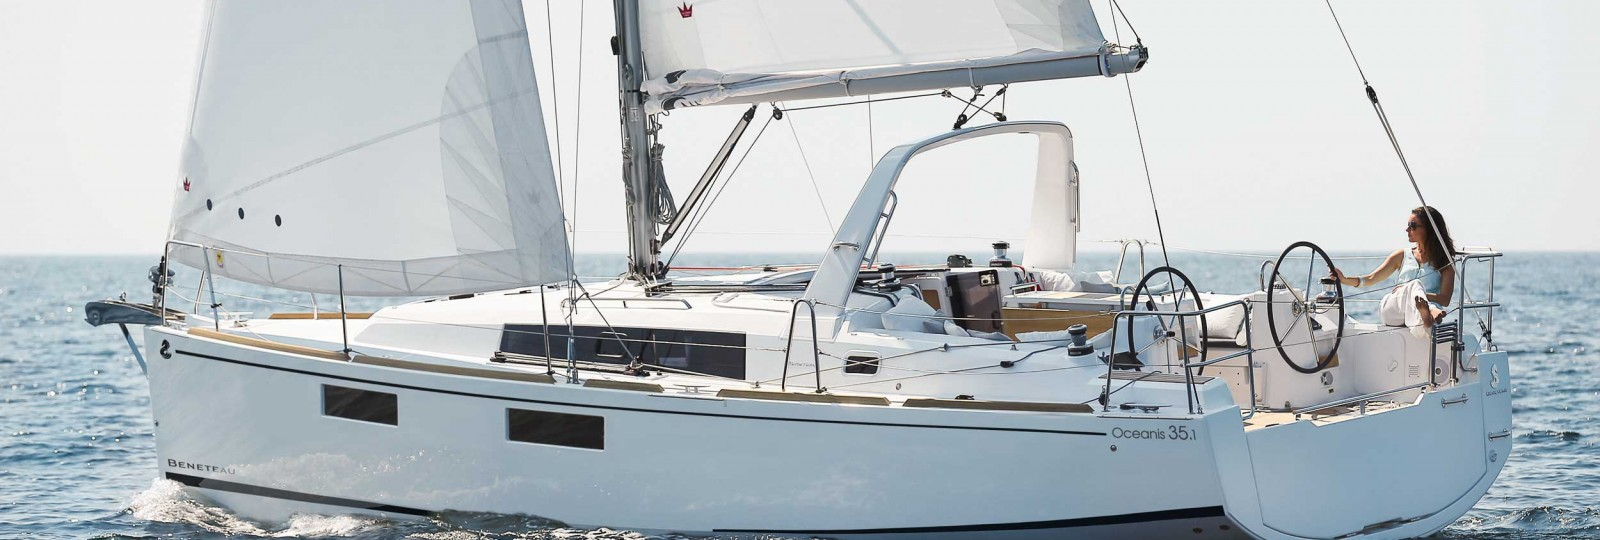 Beneteau Oceanis 35.1 running